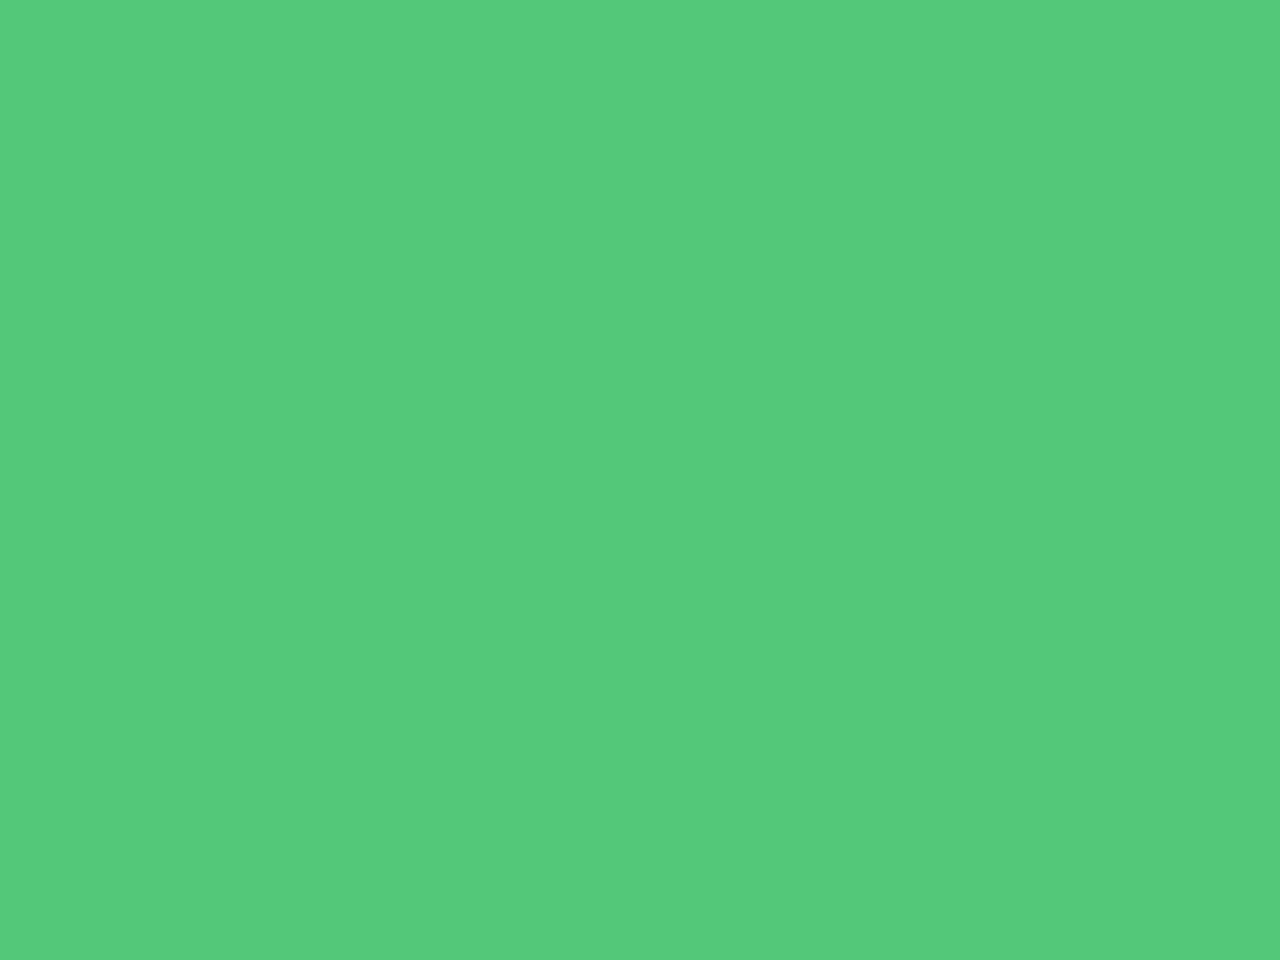 1280x960 Paris Green Solid Color Background